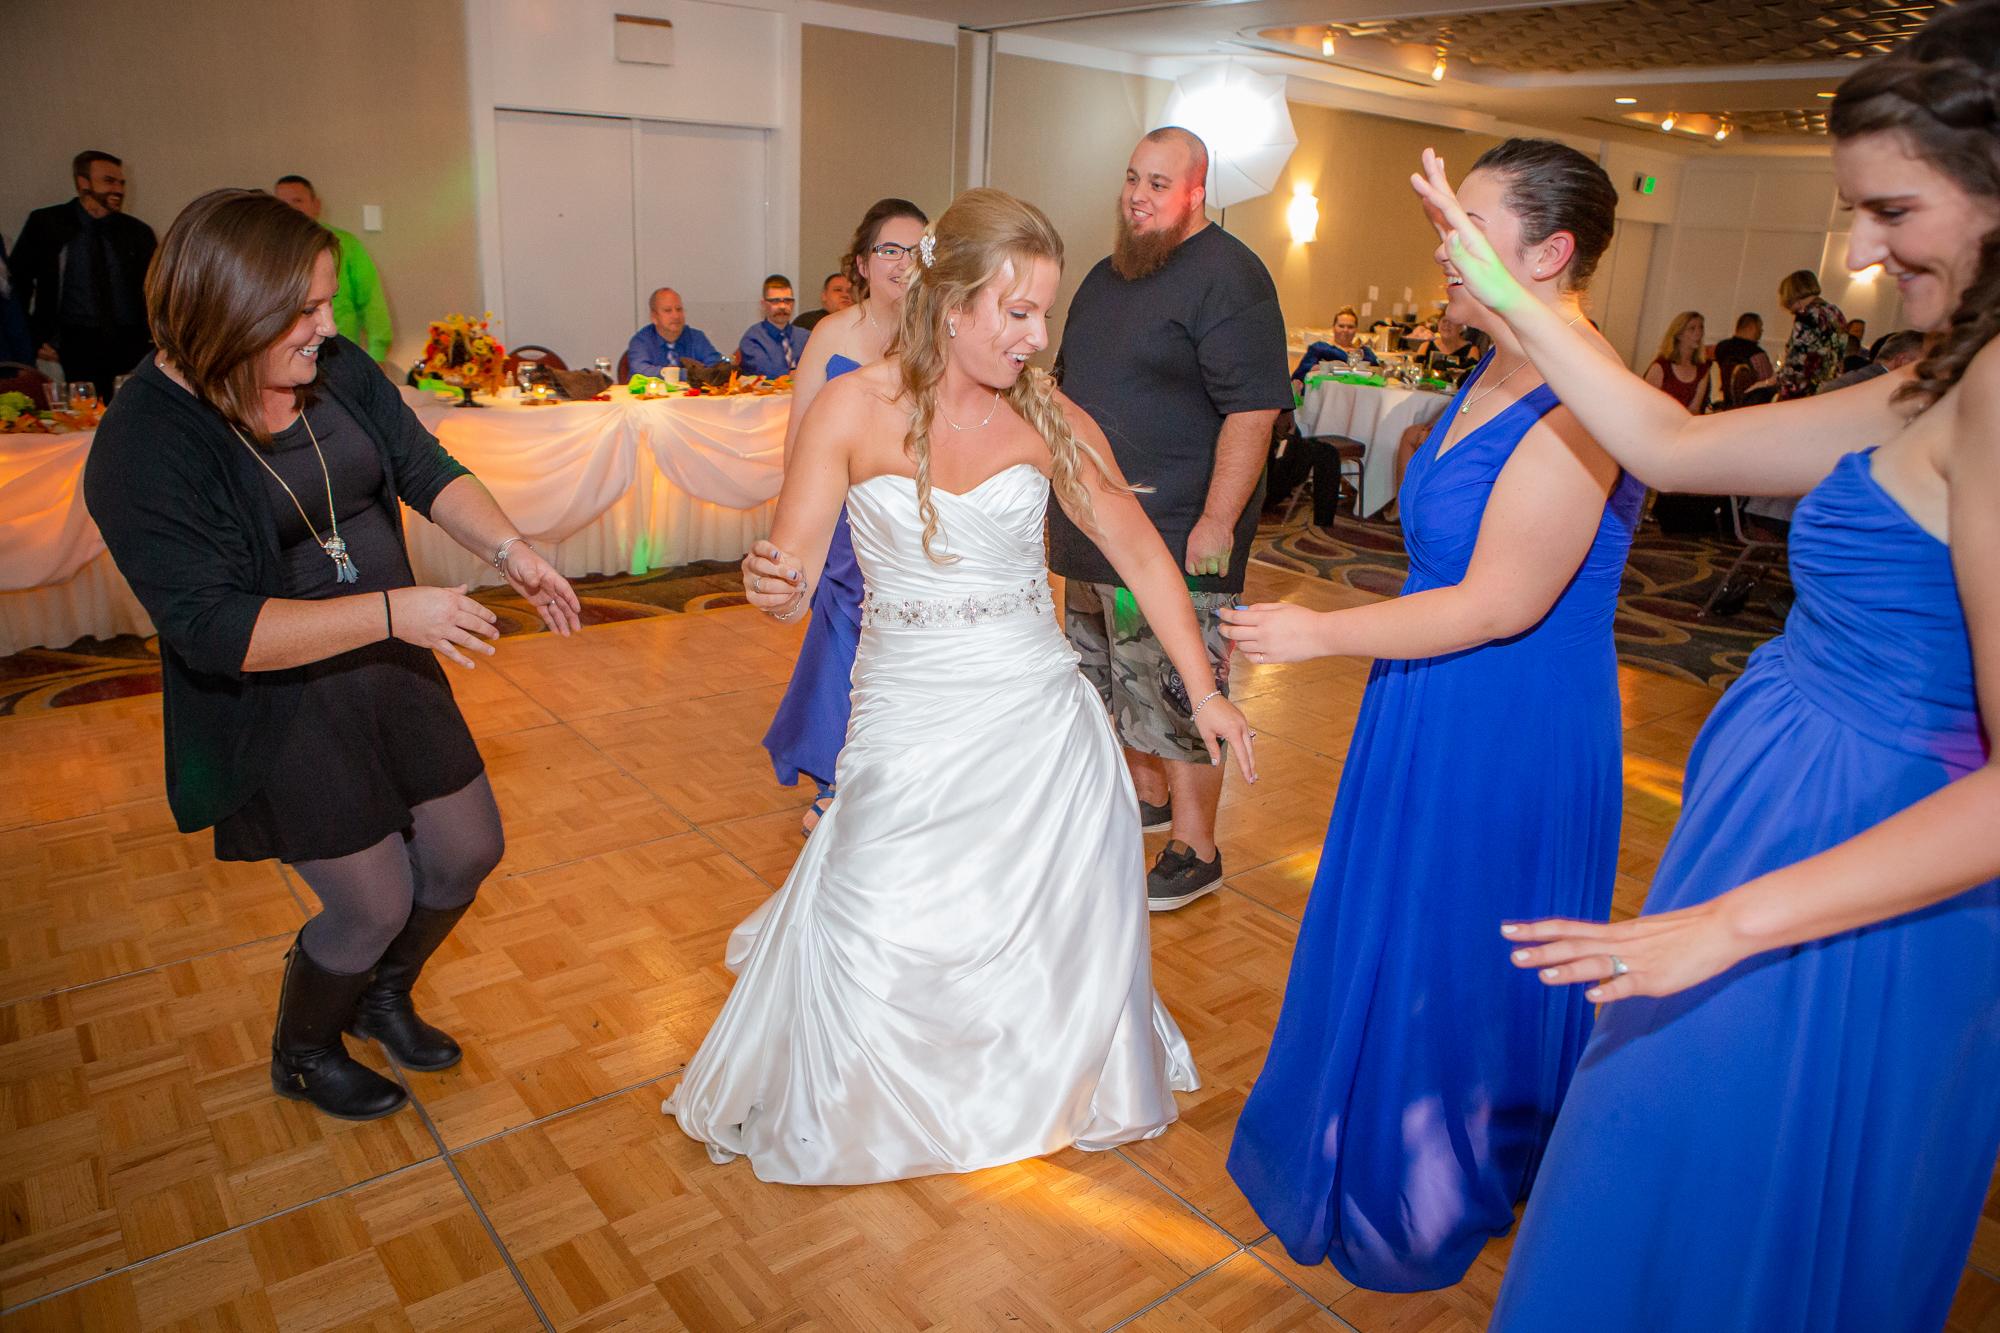 Raddison-Hotel-Corning-NY-Wedding-4723.jpg